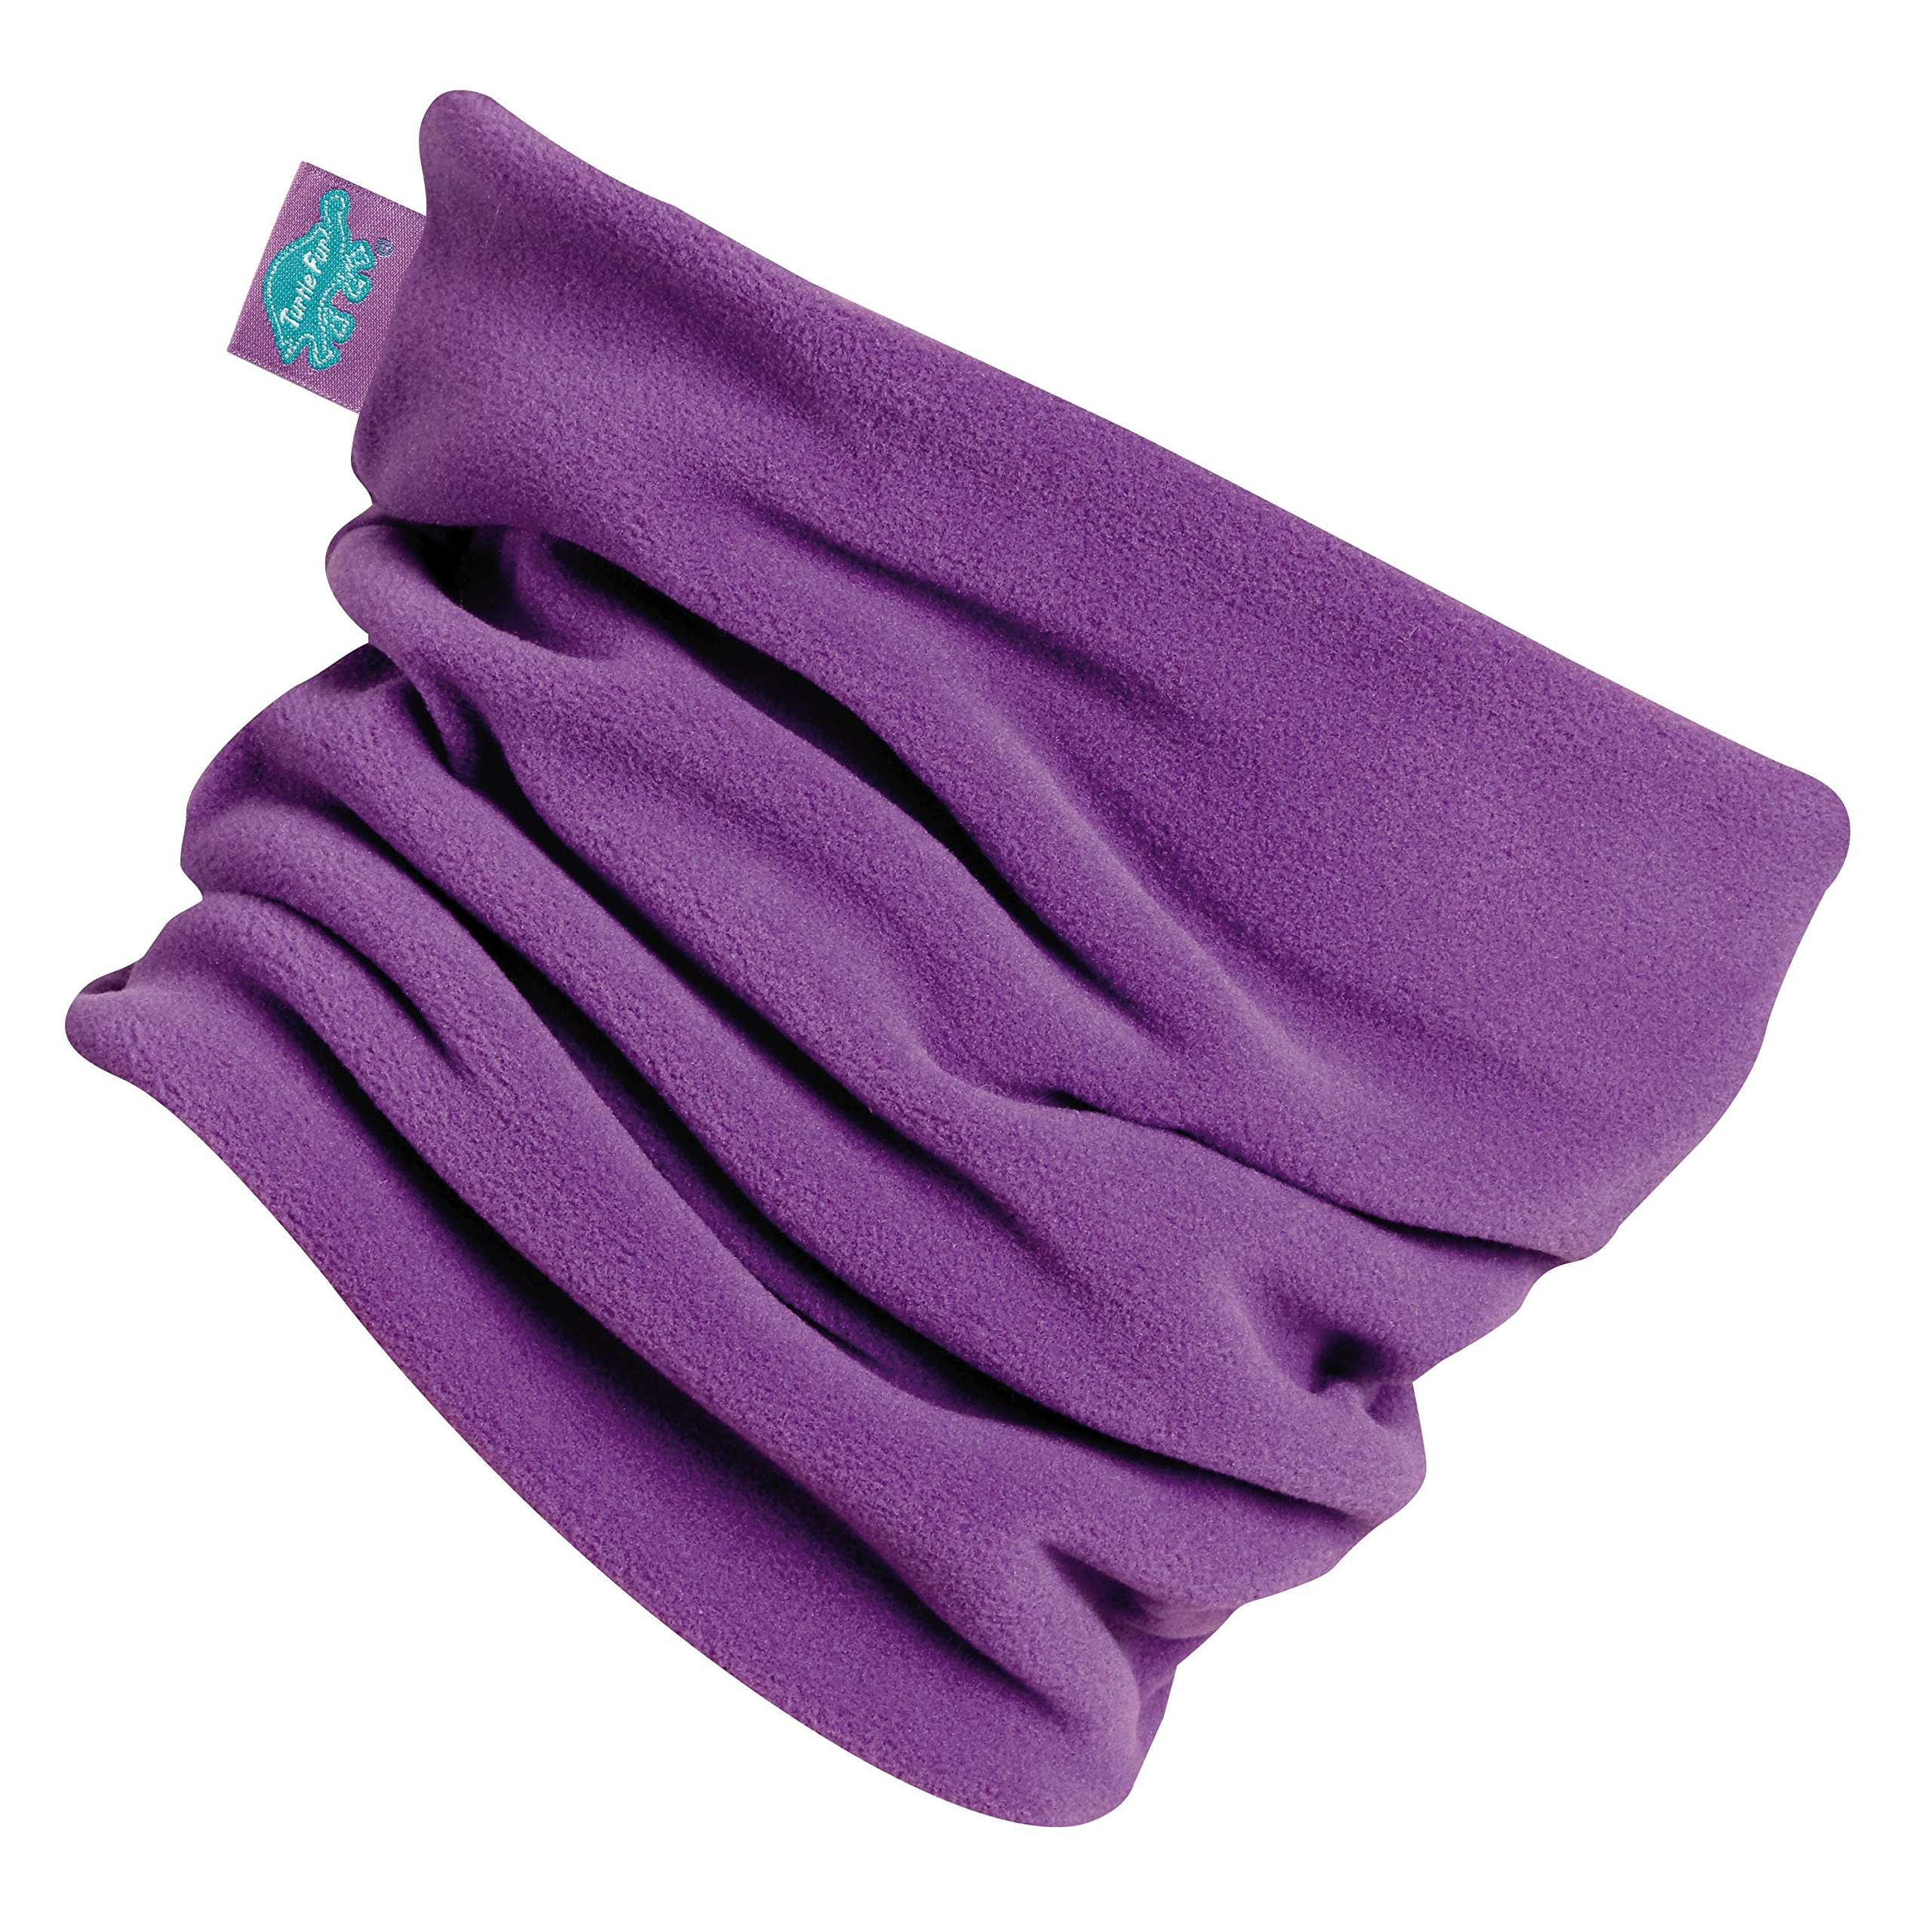 Turtle Fur Double-Layer Micro Fur Performance Fleece Neck Warmer In The Purple